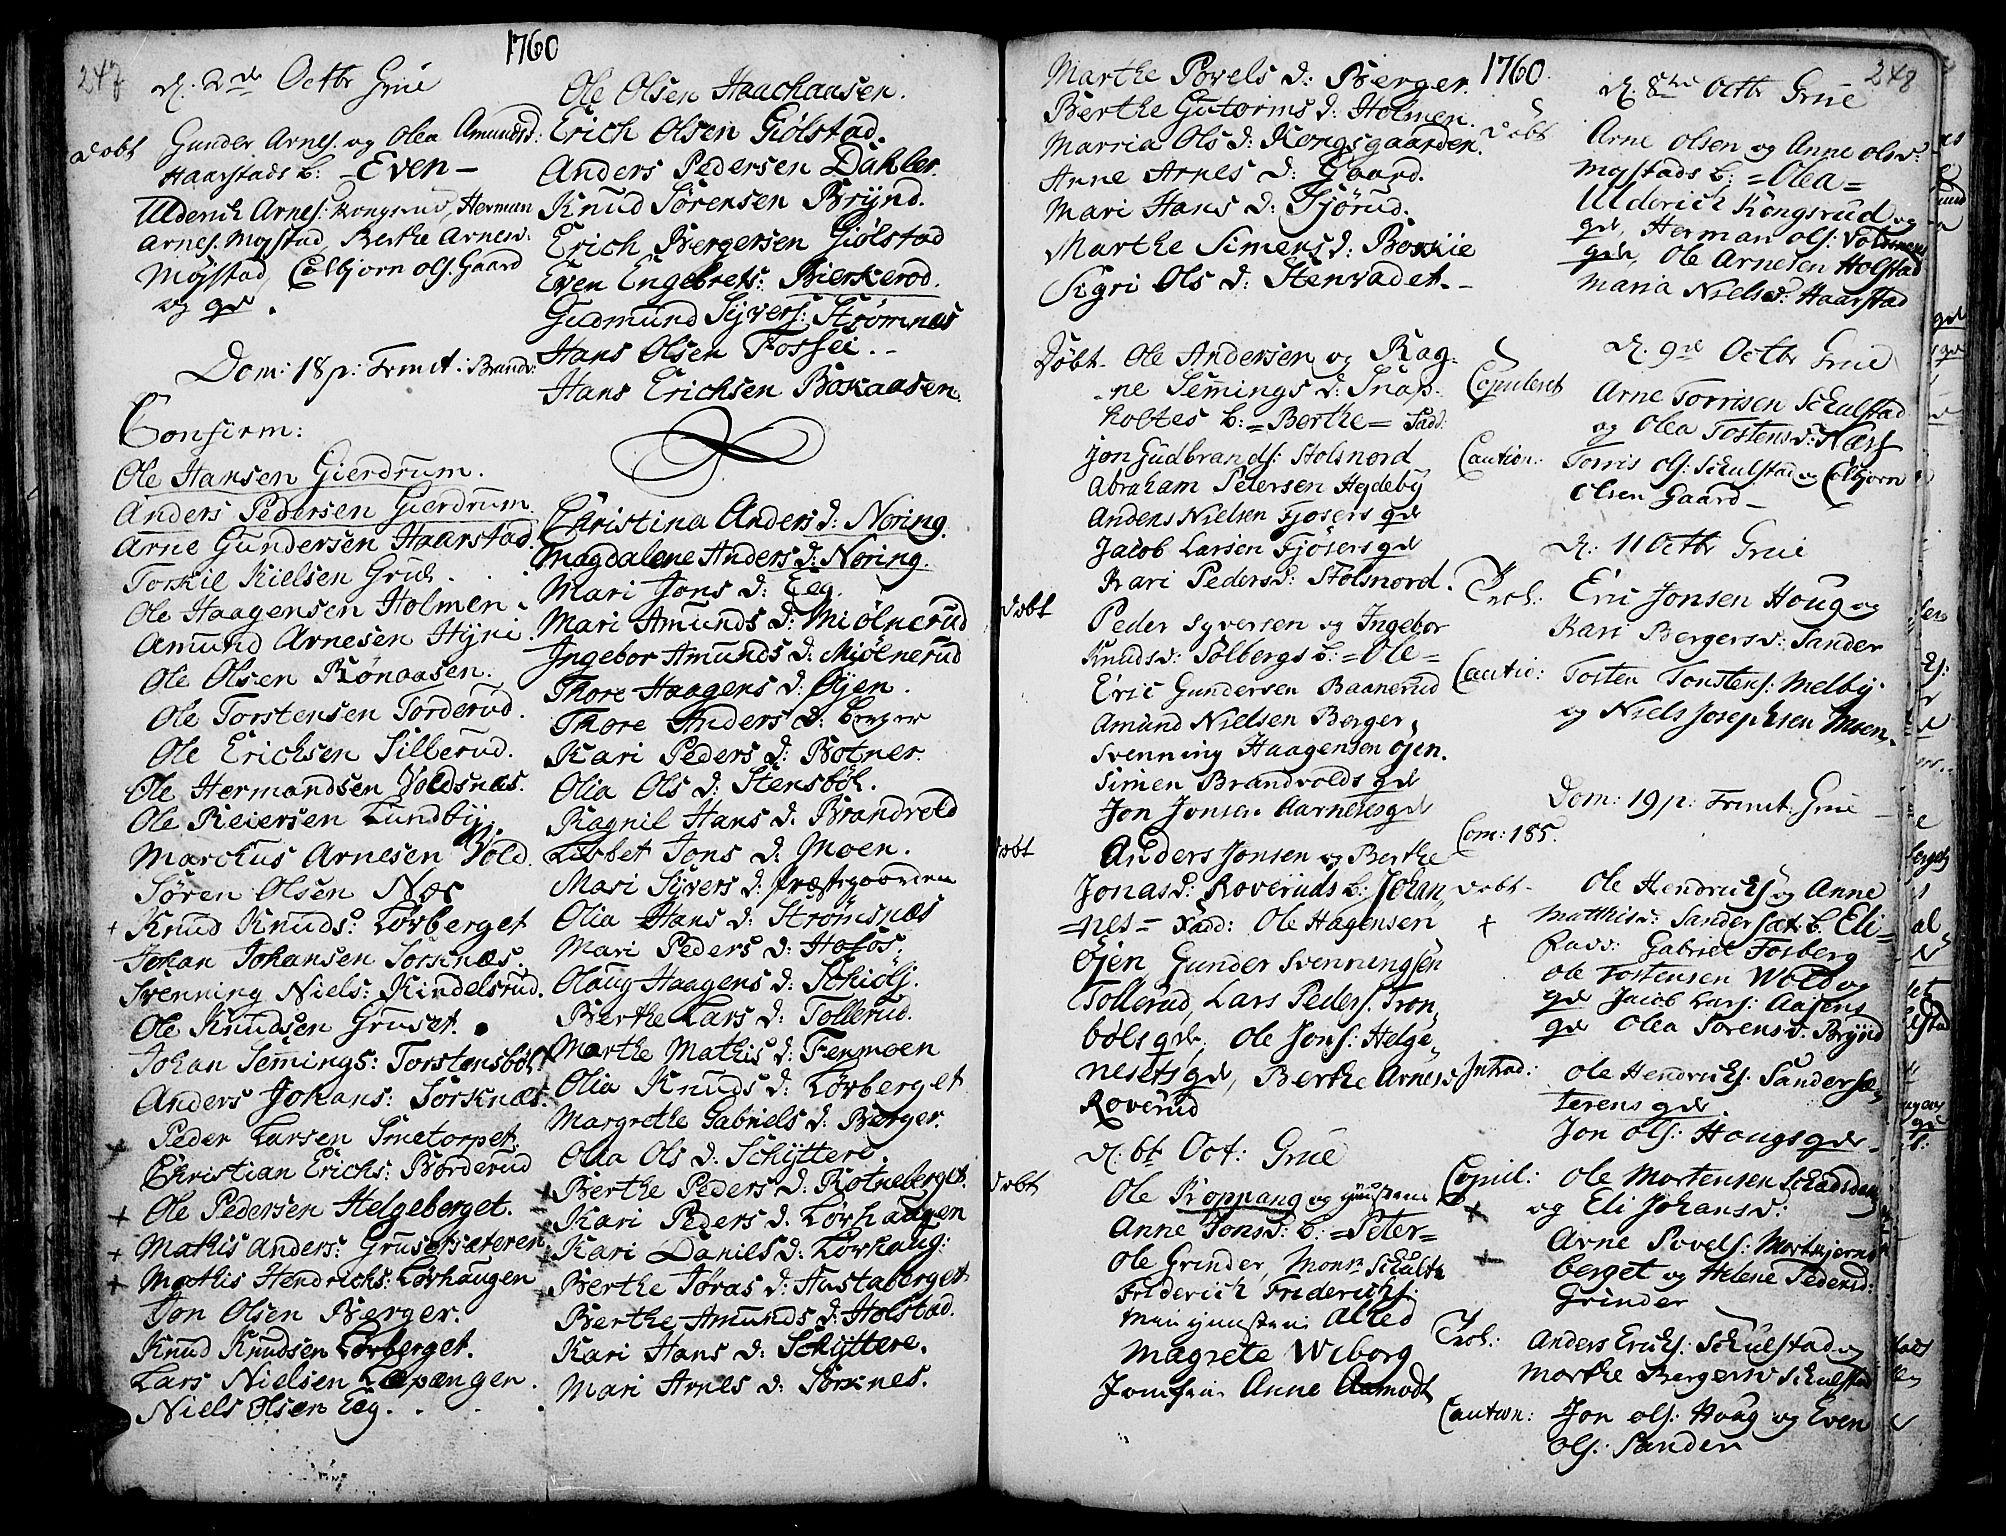 SAH, Grue prestekontor, Ministerialbok nr. 2, 1749-1774, s. 247-248